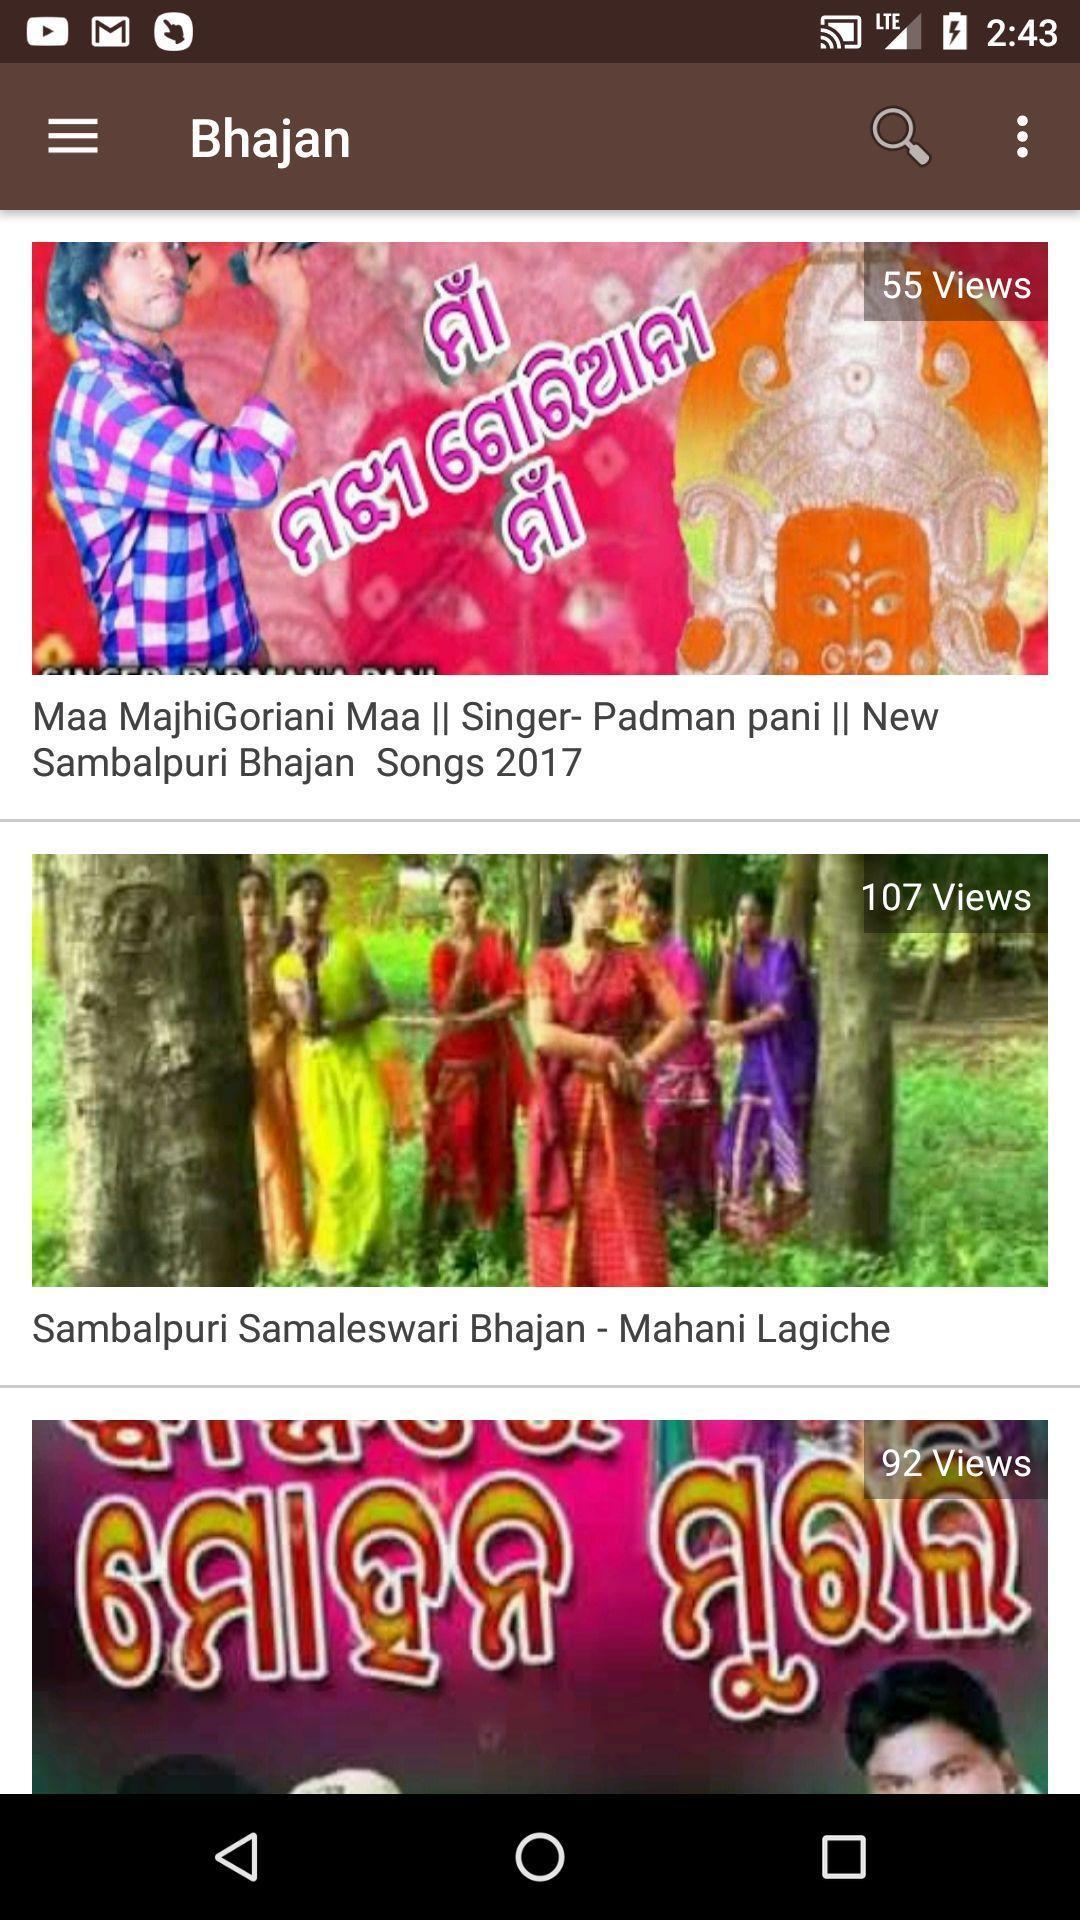 Sambalpuri Song - Video, Album, Comedy, DJ, Bhajan for